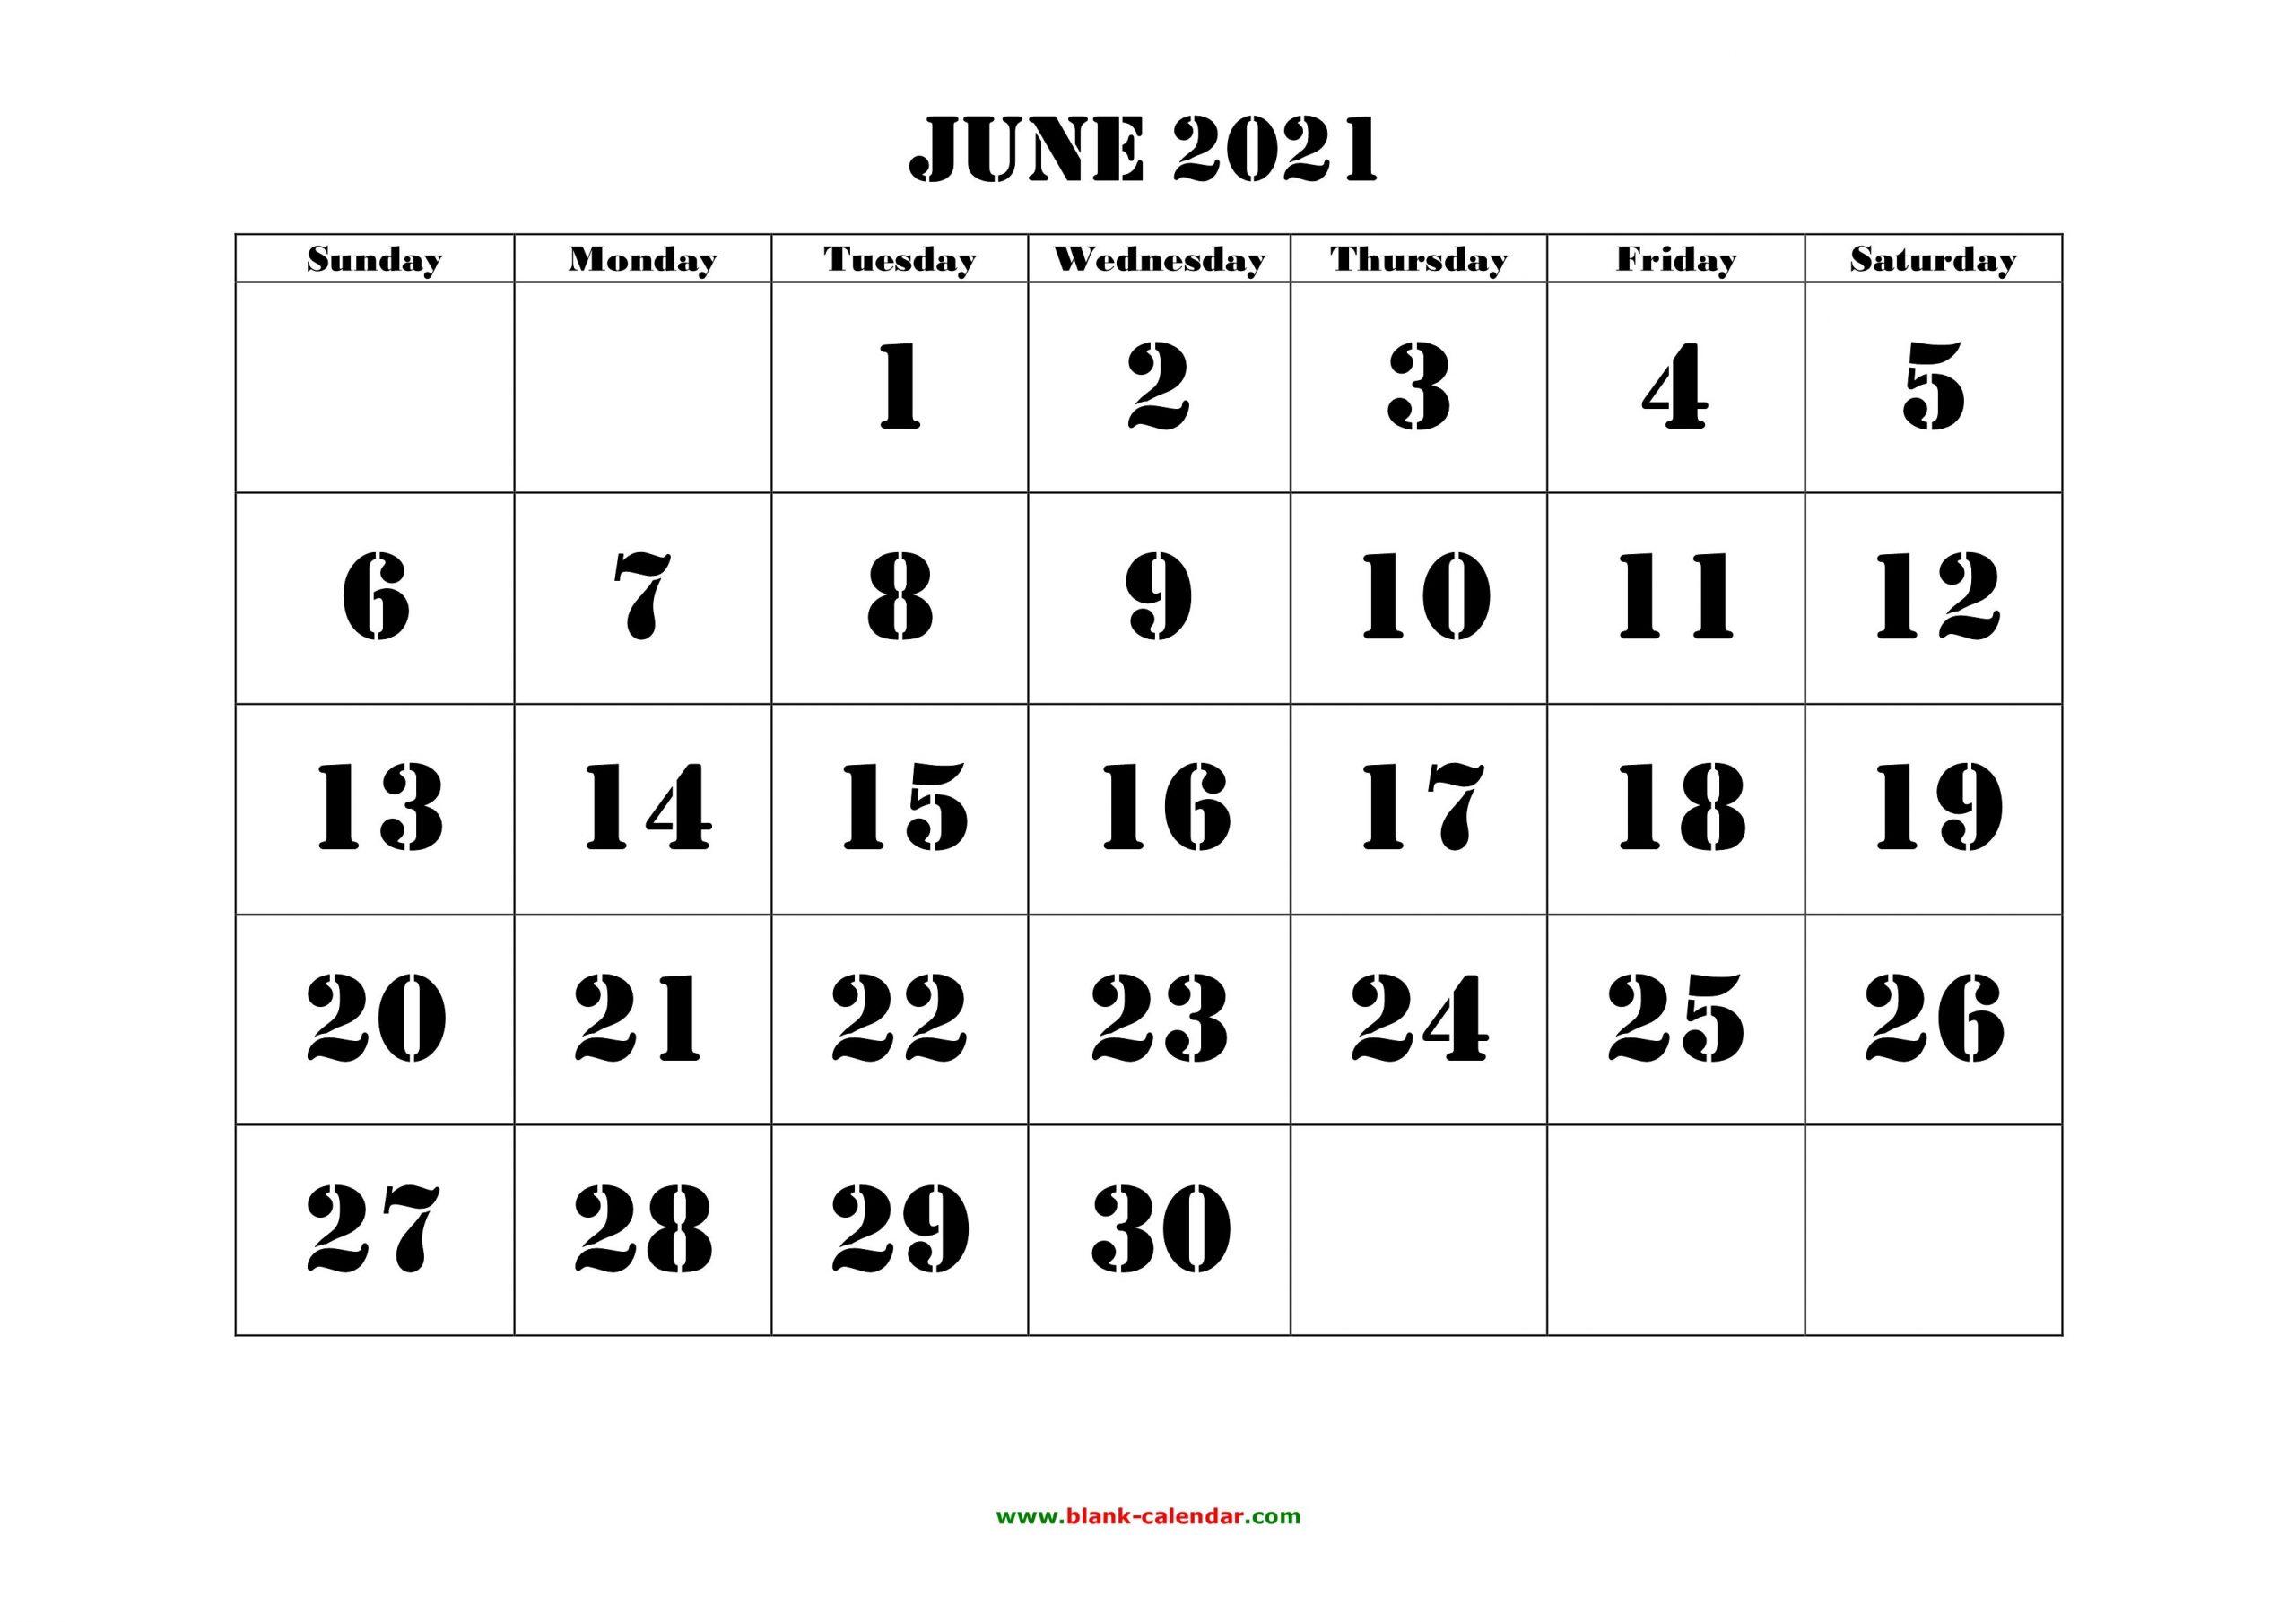 Free Download Printable June 2021 Calendar, Large Font